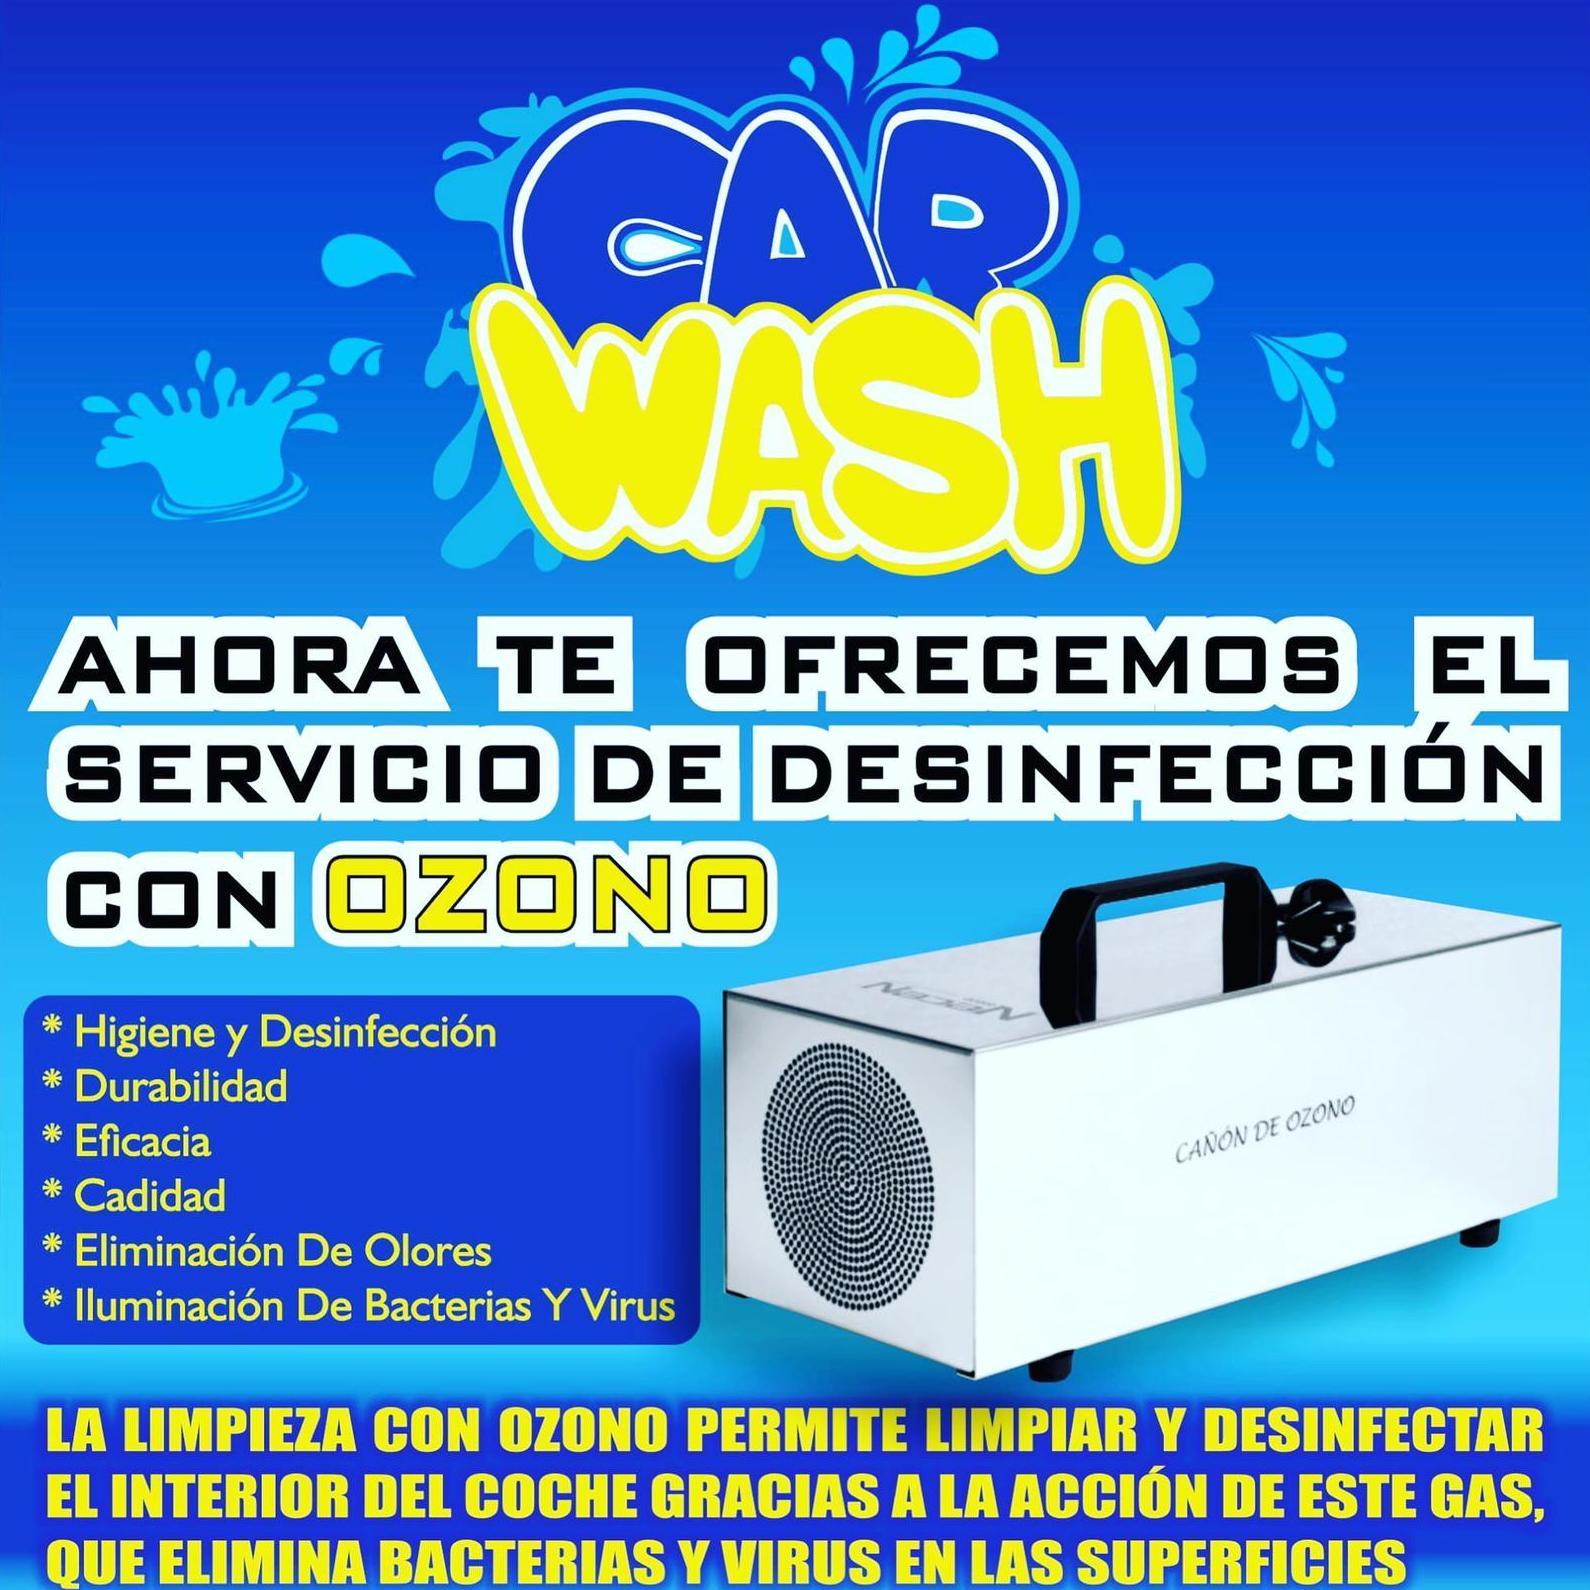 Car Wash Alcorcón